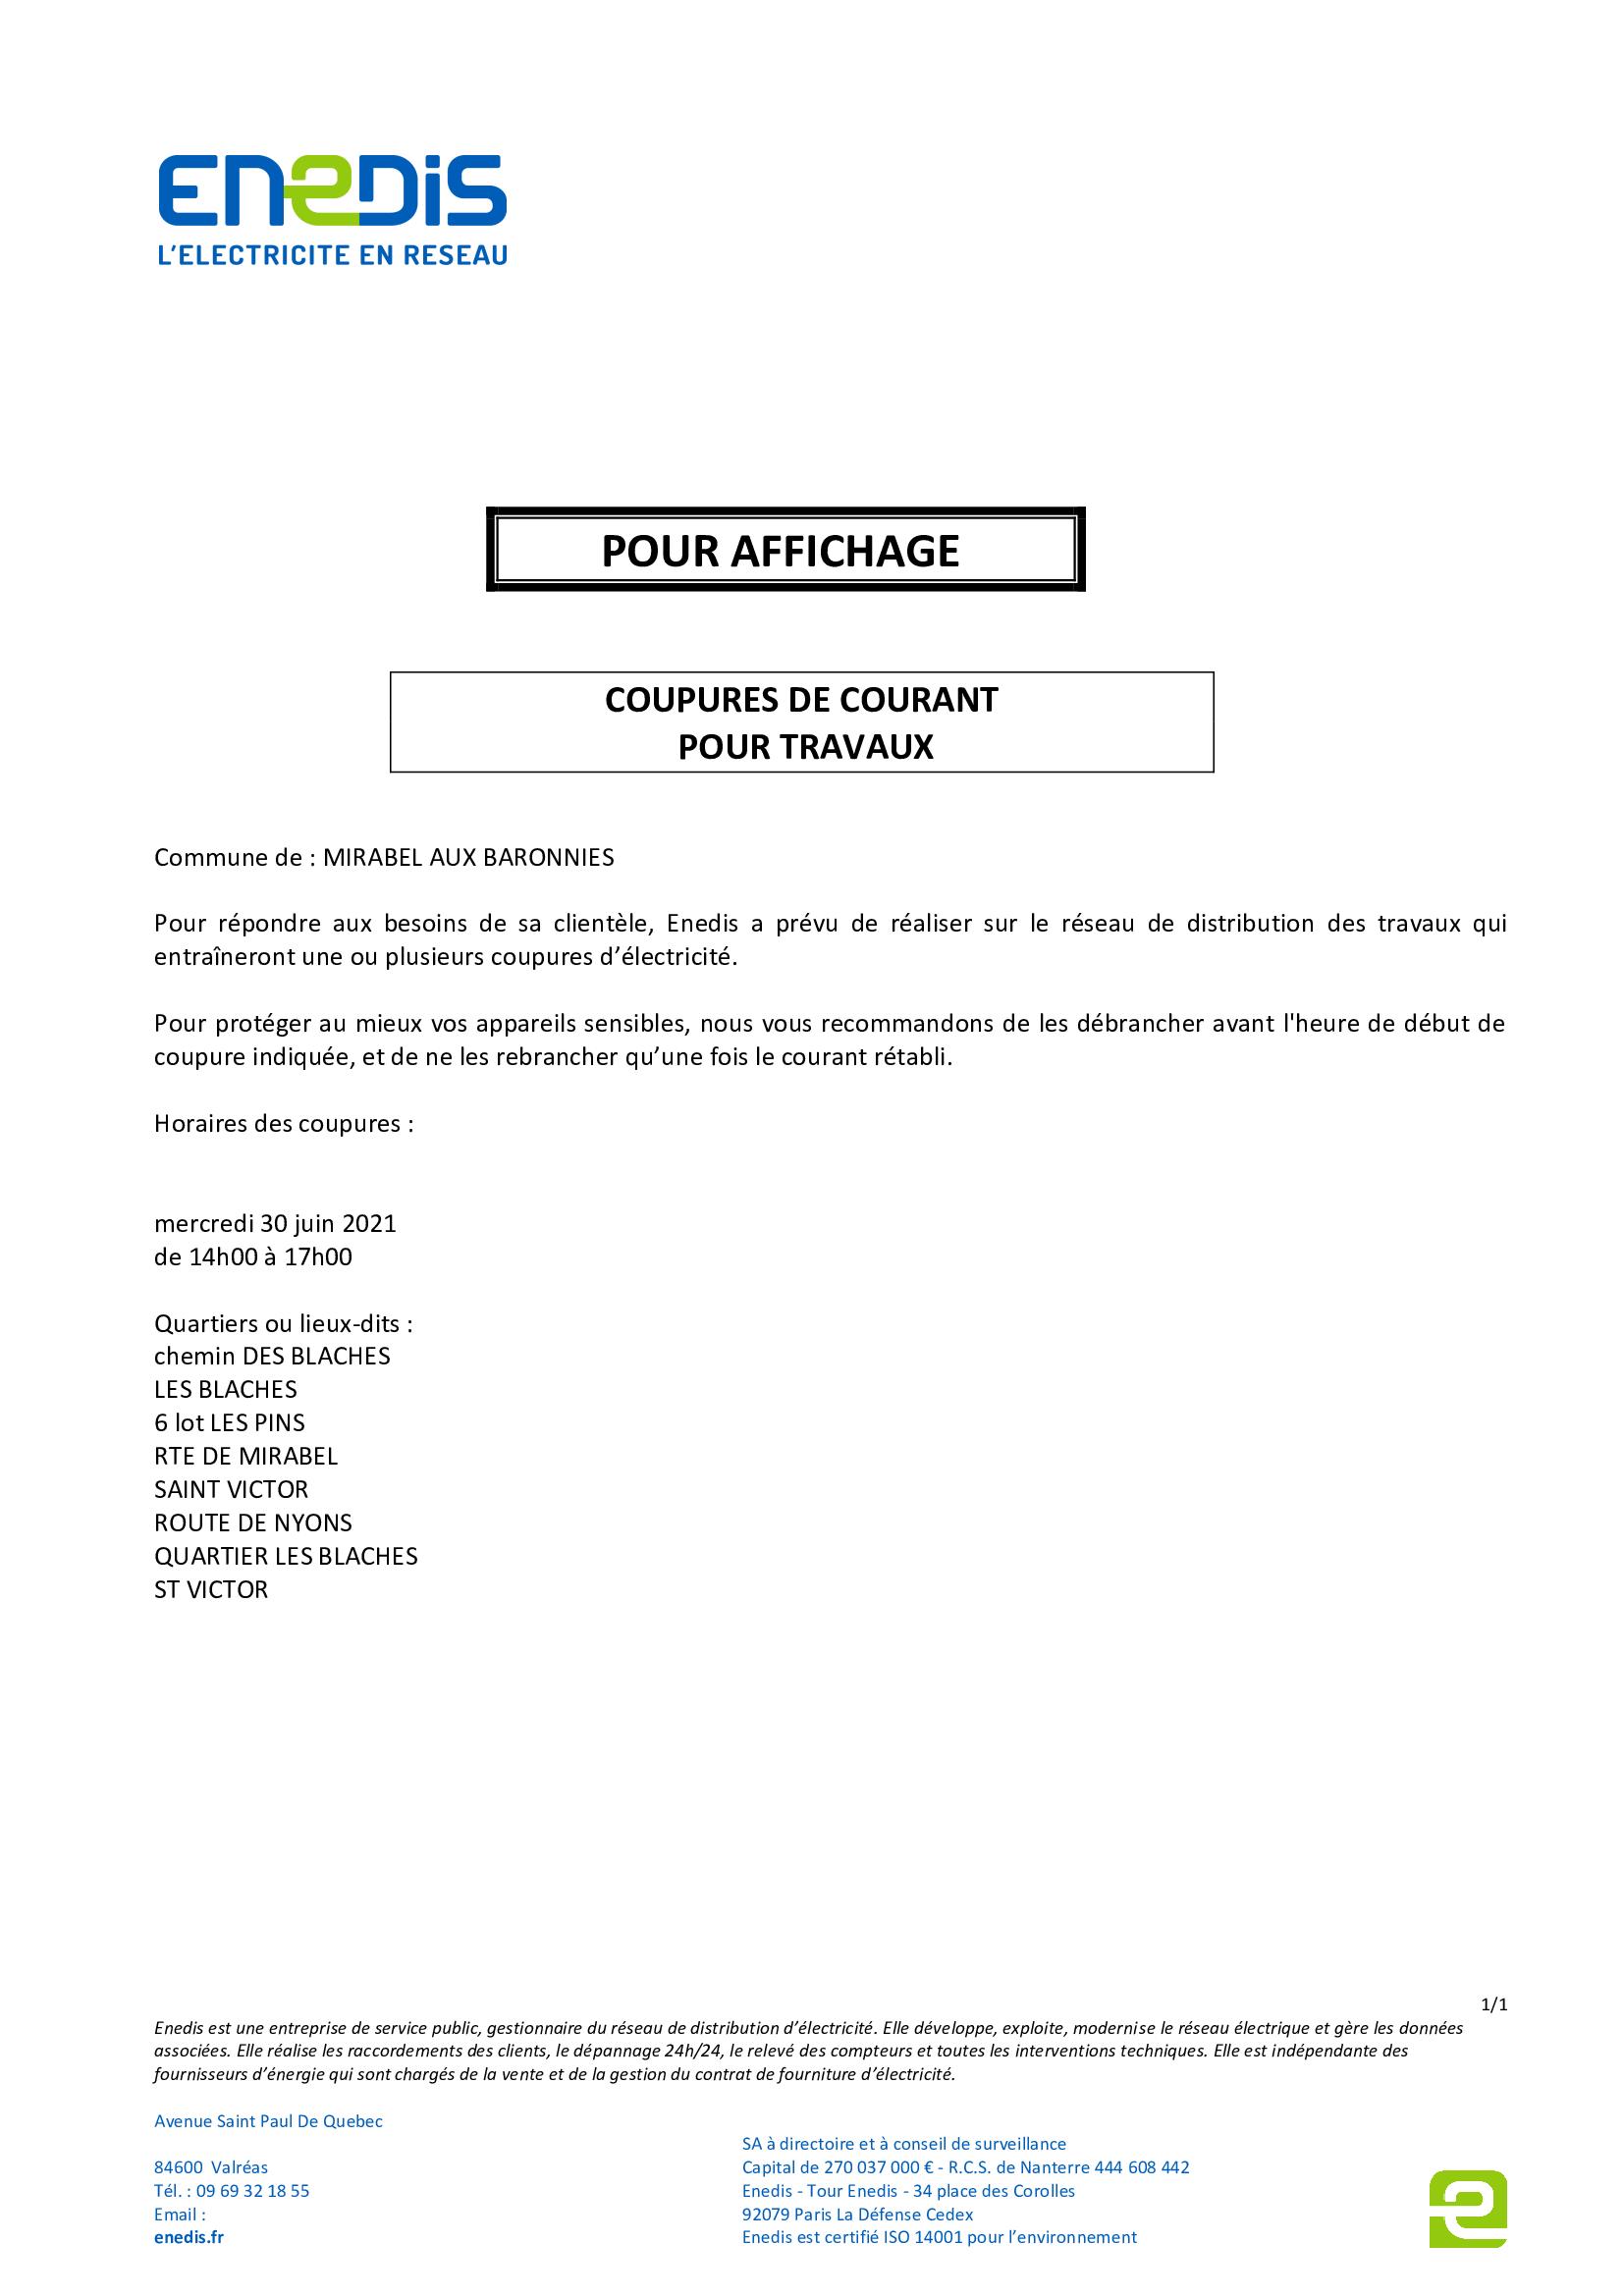 197-AVCT20210608163441.22635-MIRABEL-AUX-BARONNIES-20210602132158_ProgTx-Mairie-PJ-20210311-1008-1